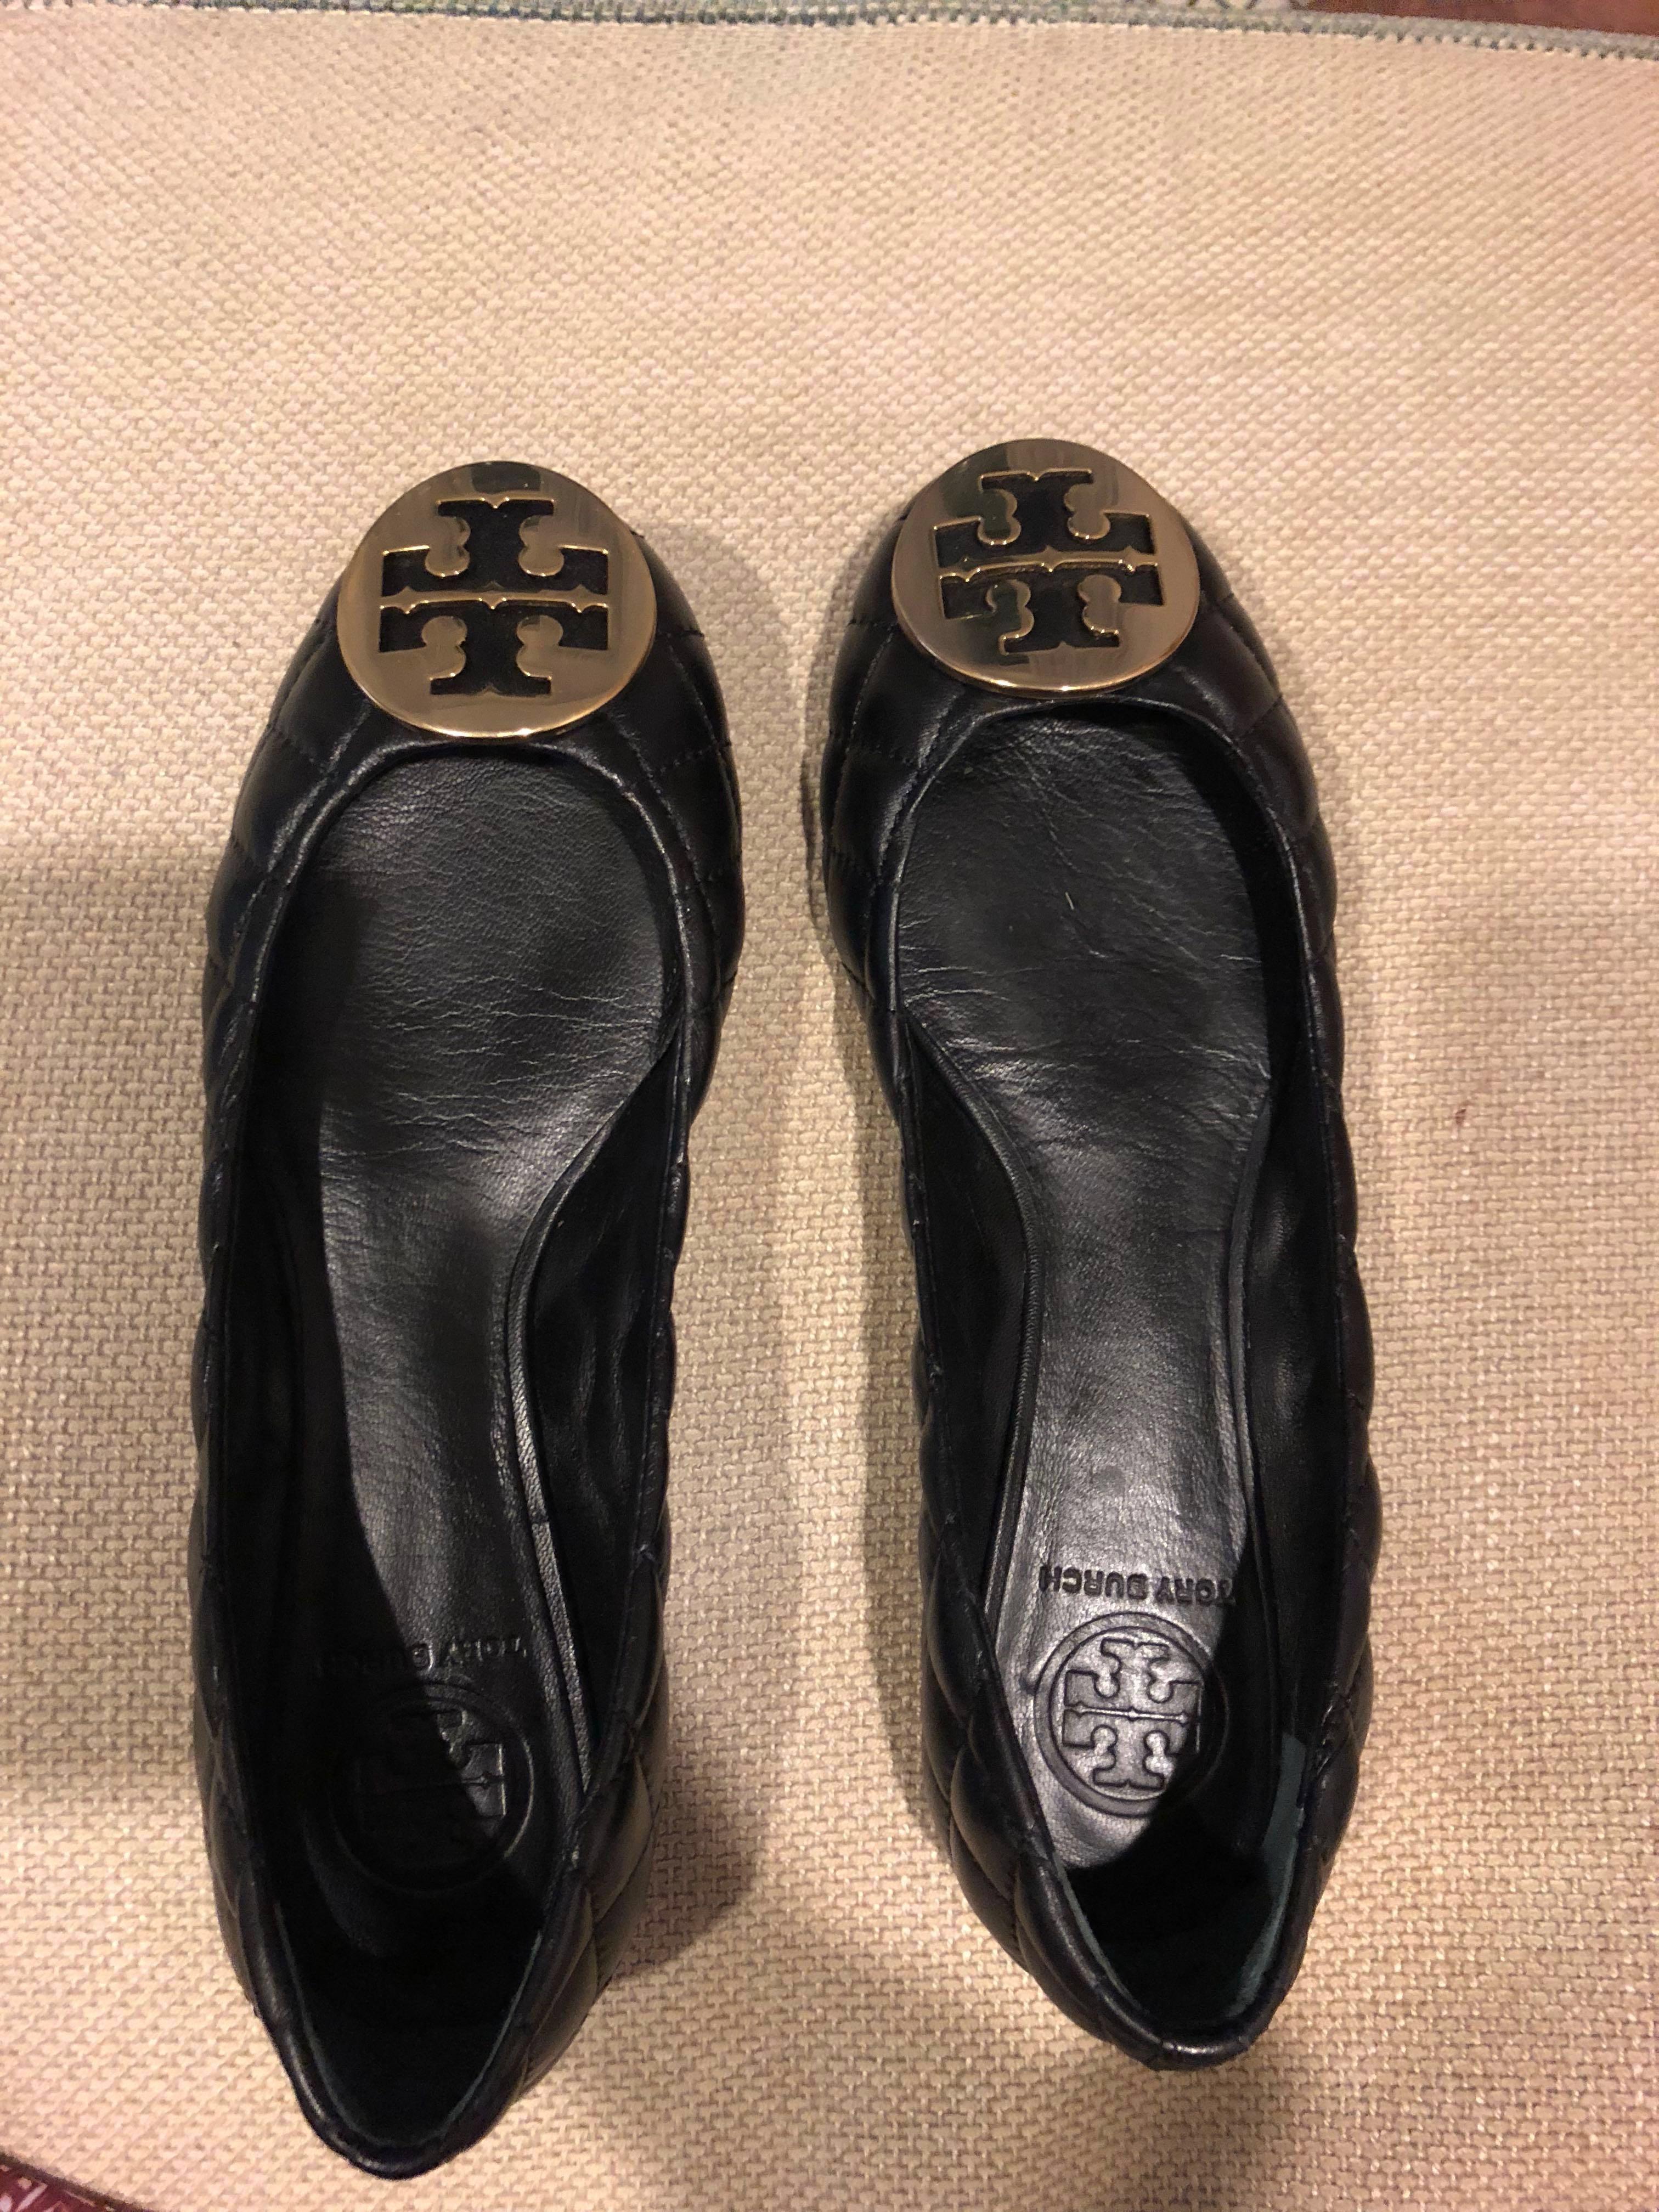 735603cf27fd Like NEW Tory Burch Shoes